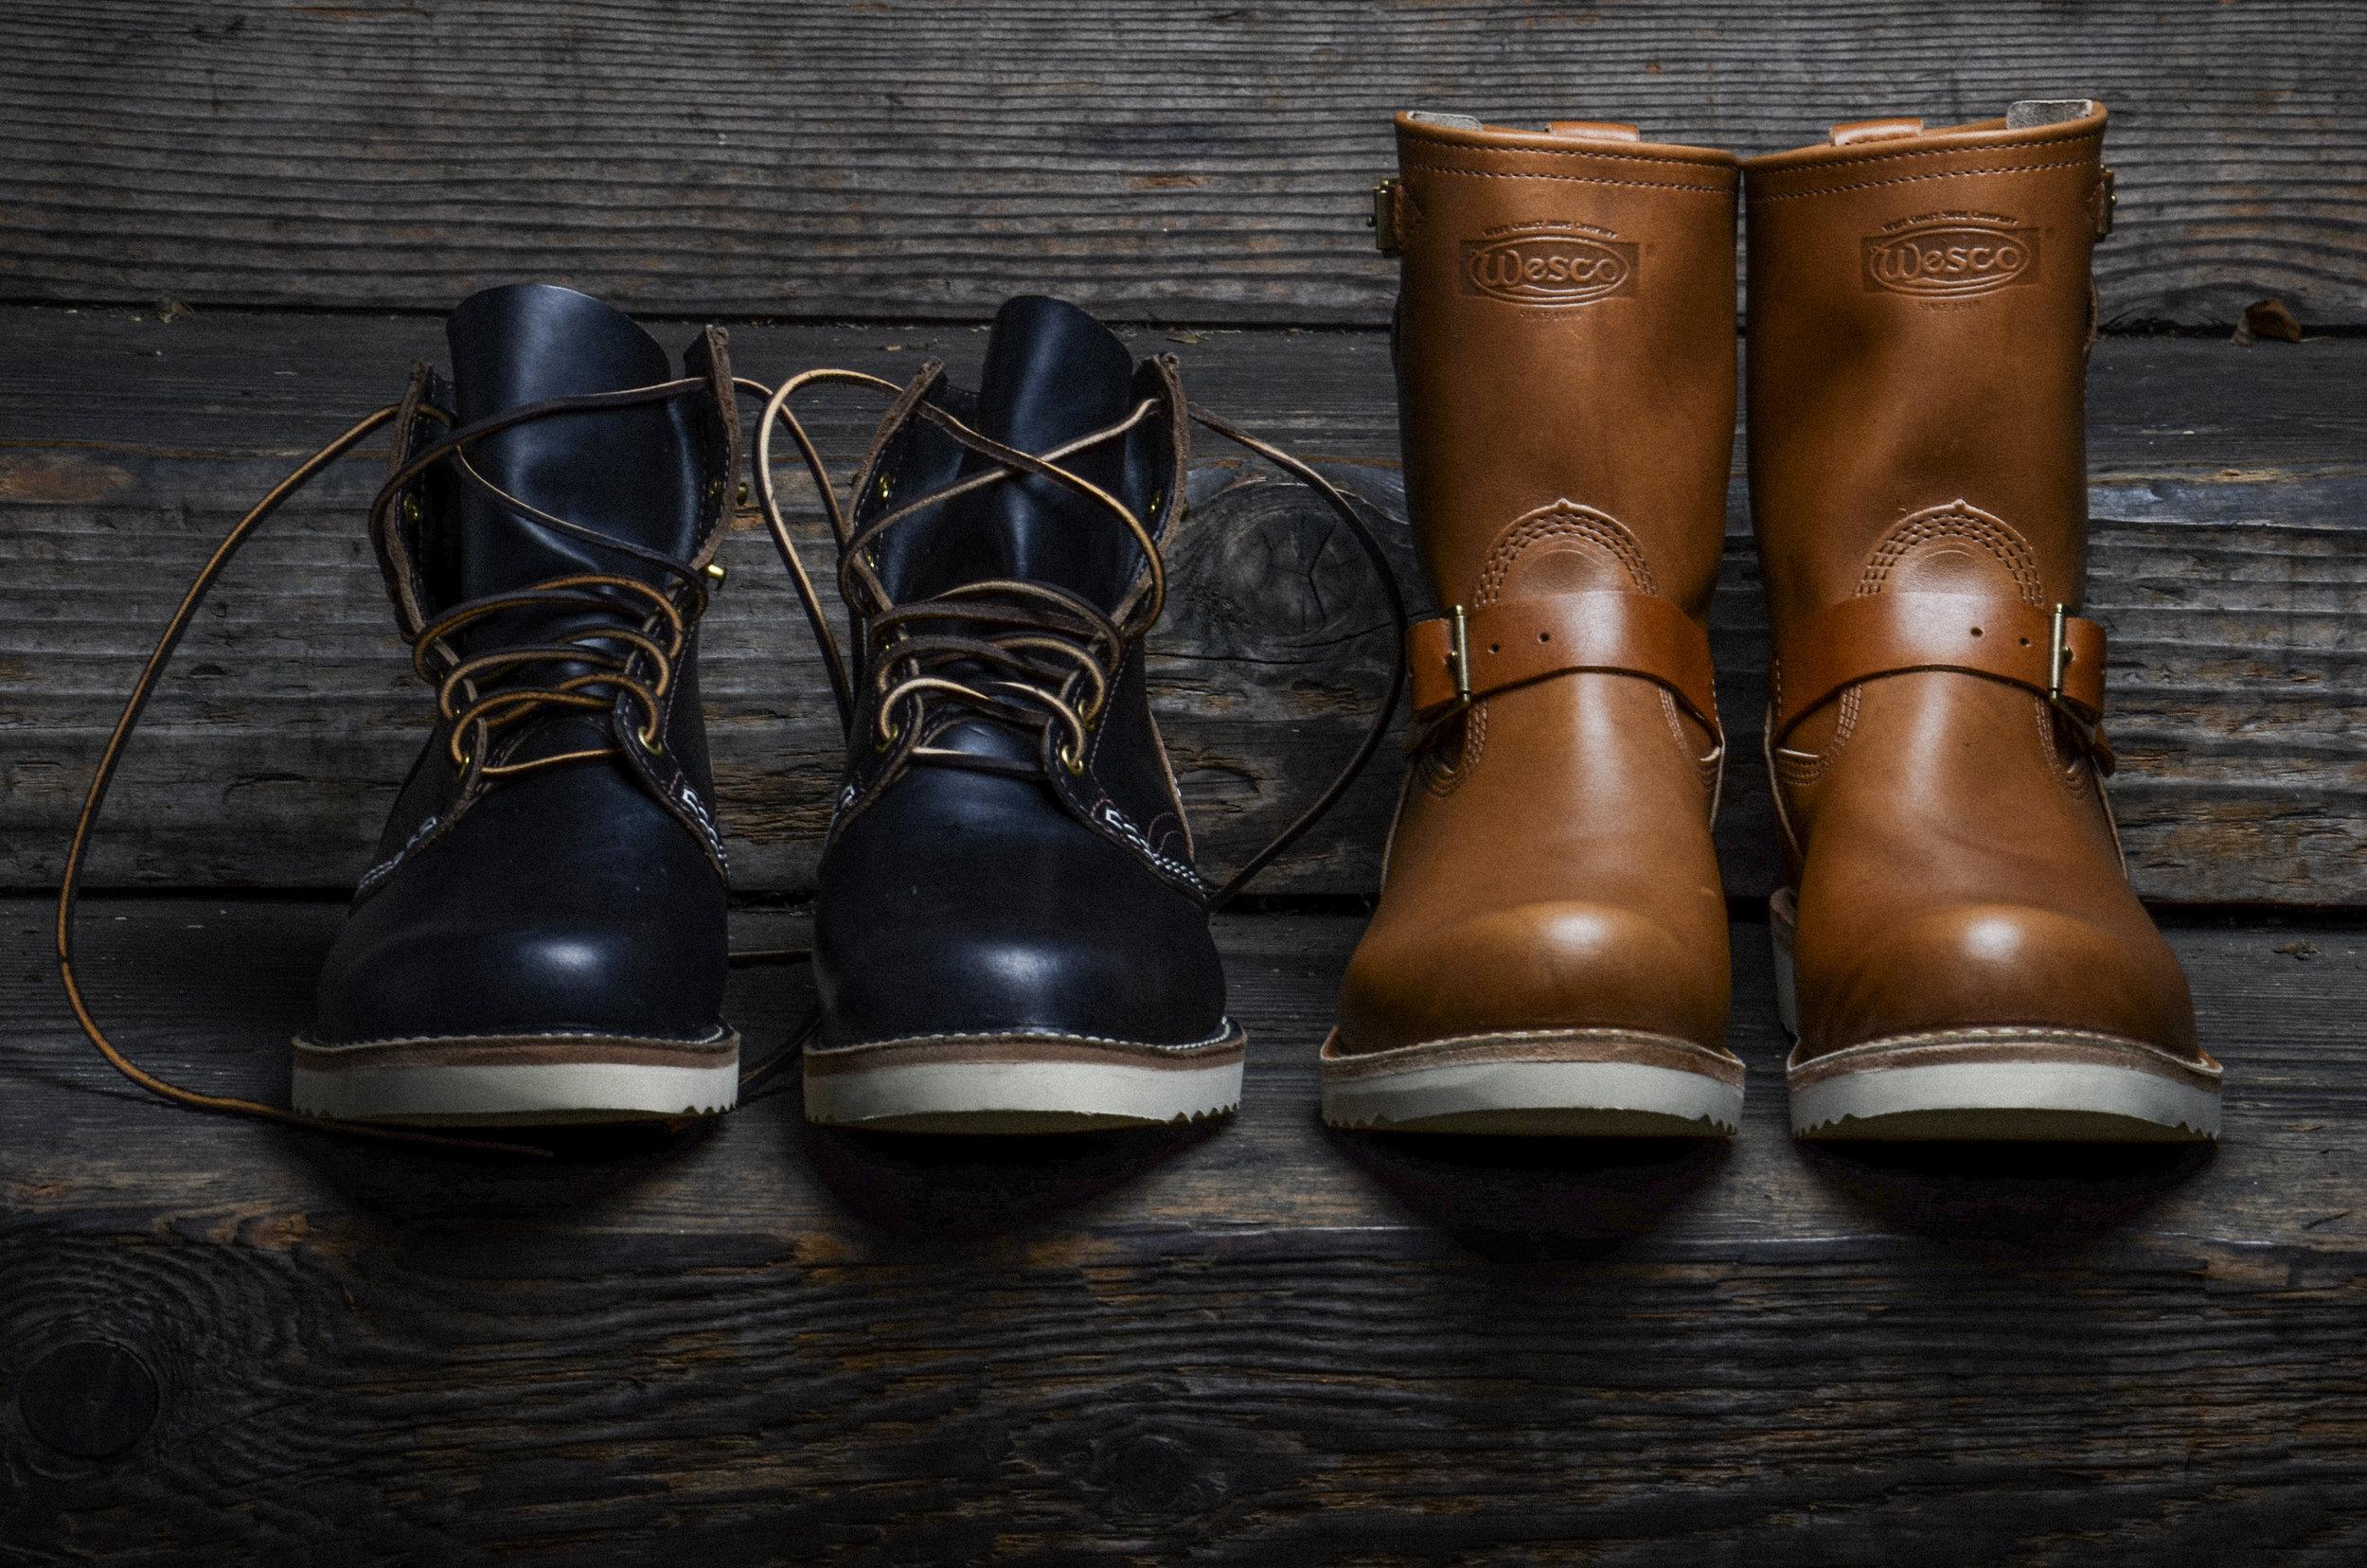 Black Bear Brand x Wesco x Horween boot collection https://blackbearunion.com/black-bear-brand-factory-store/?category=Footwear